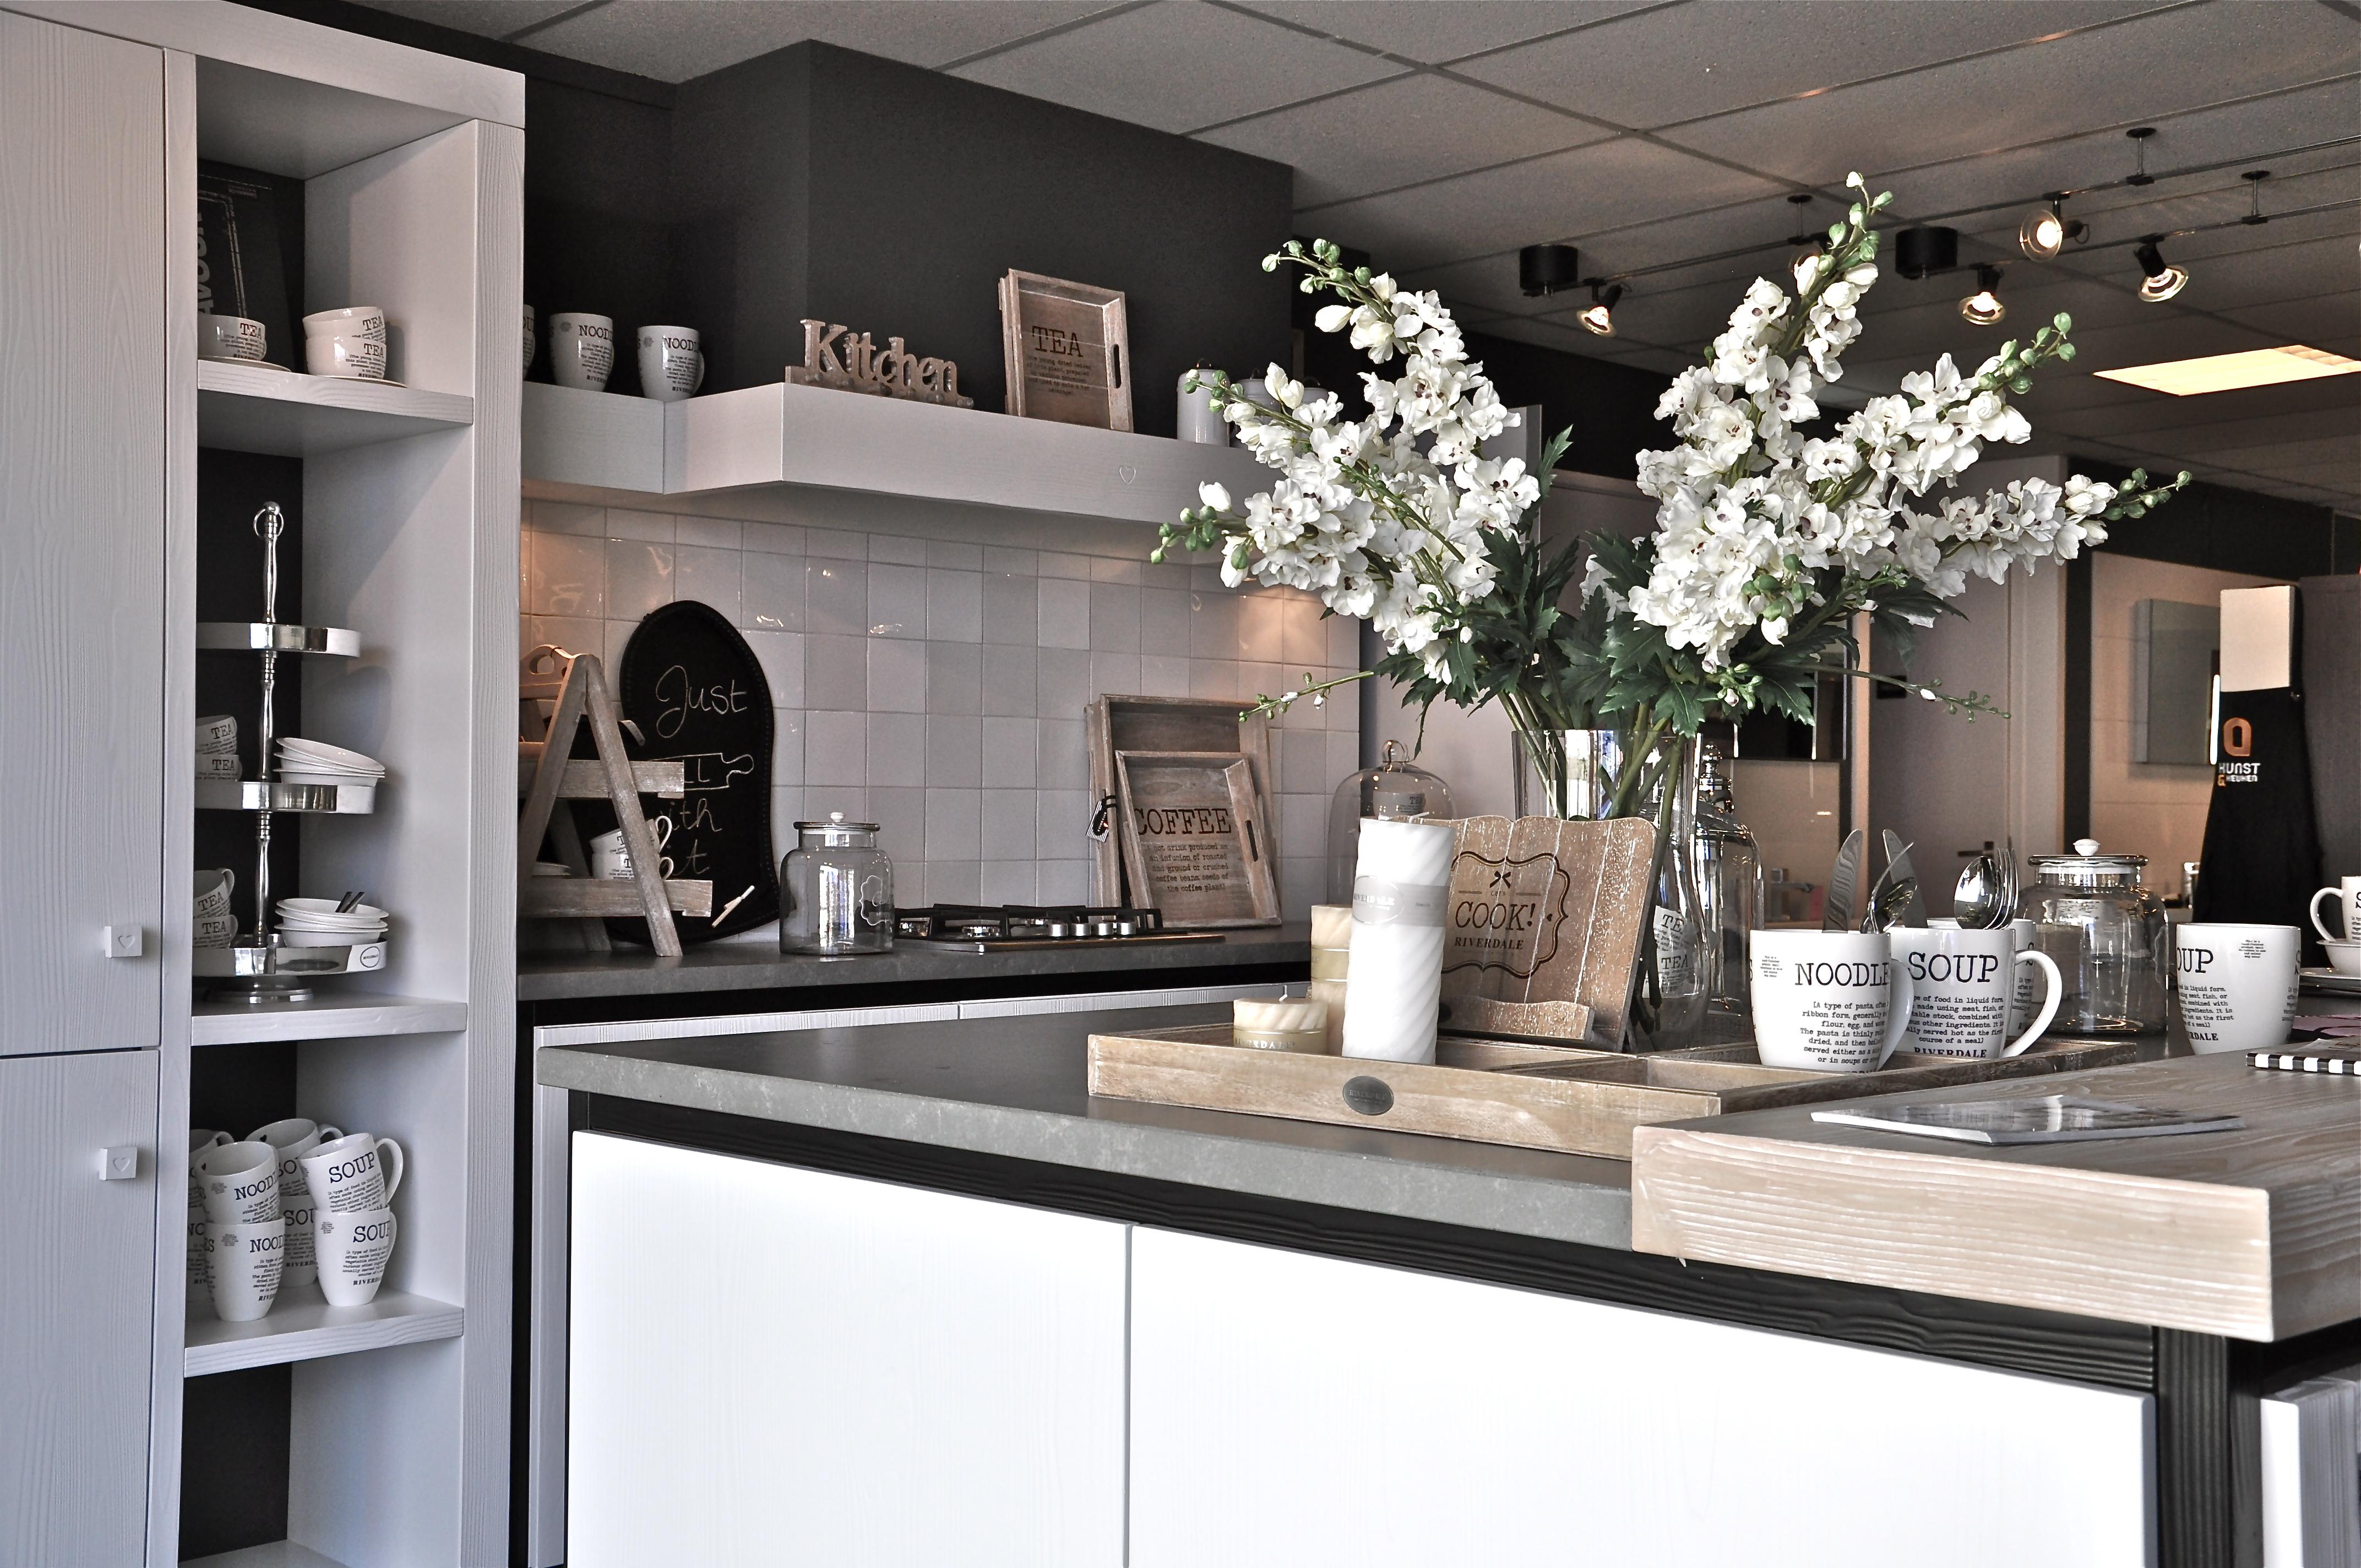 Keuken Design Emmeloord : Keuken emmeloord home keuken emmeloord huis ontwerp ideeen